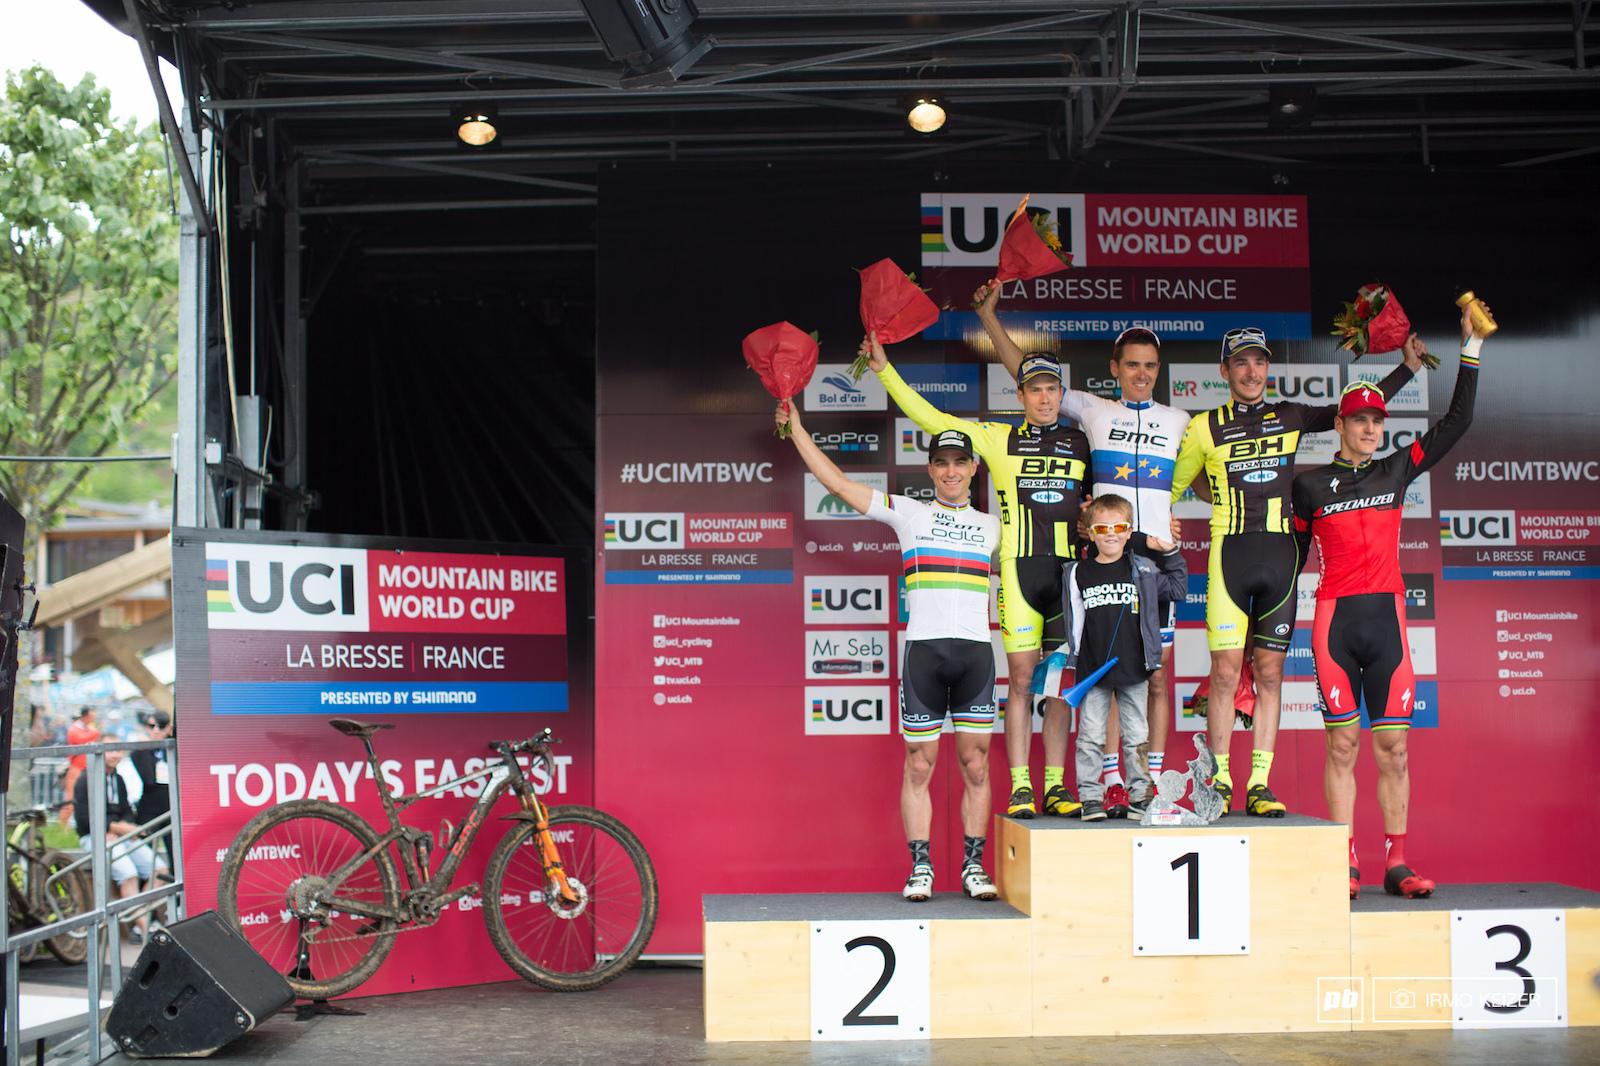 Your men s podium with Julien Absalon Maxime Marotte Victor Koretzky Nino Schurter and Jaroslav Kulhavy